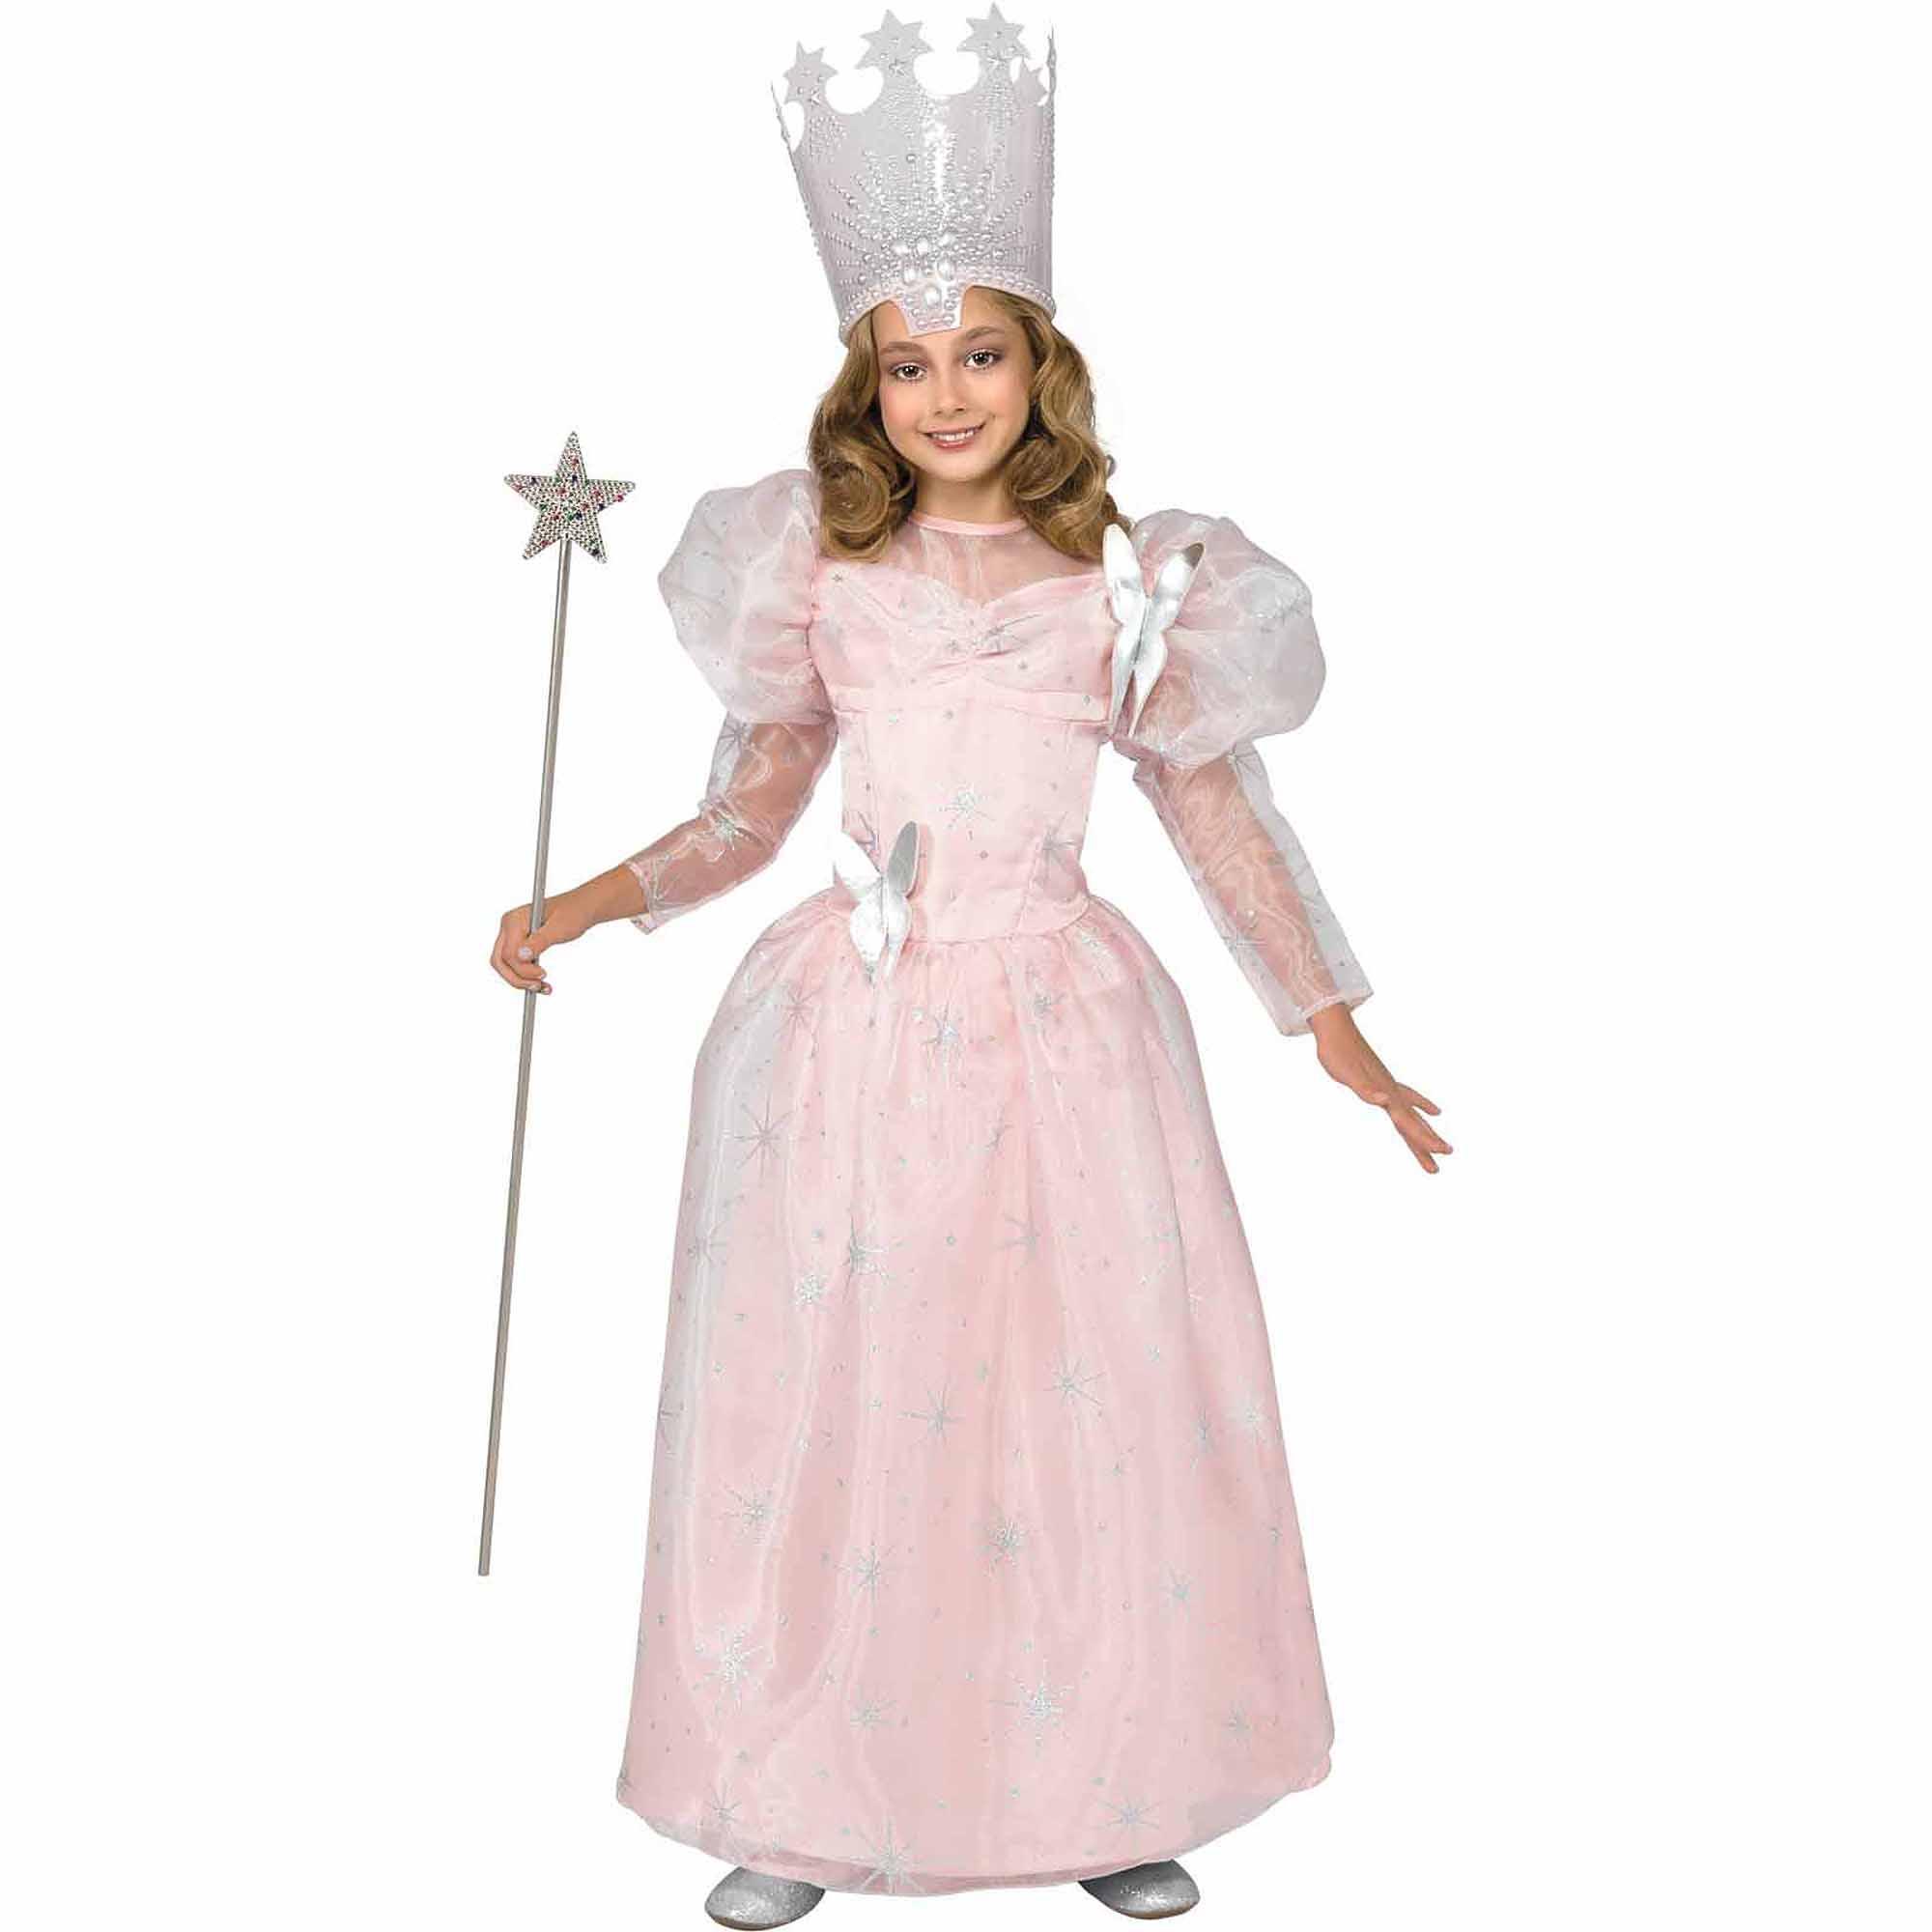 Thanks Adult costume glinda halloween